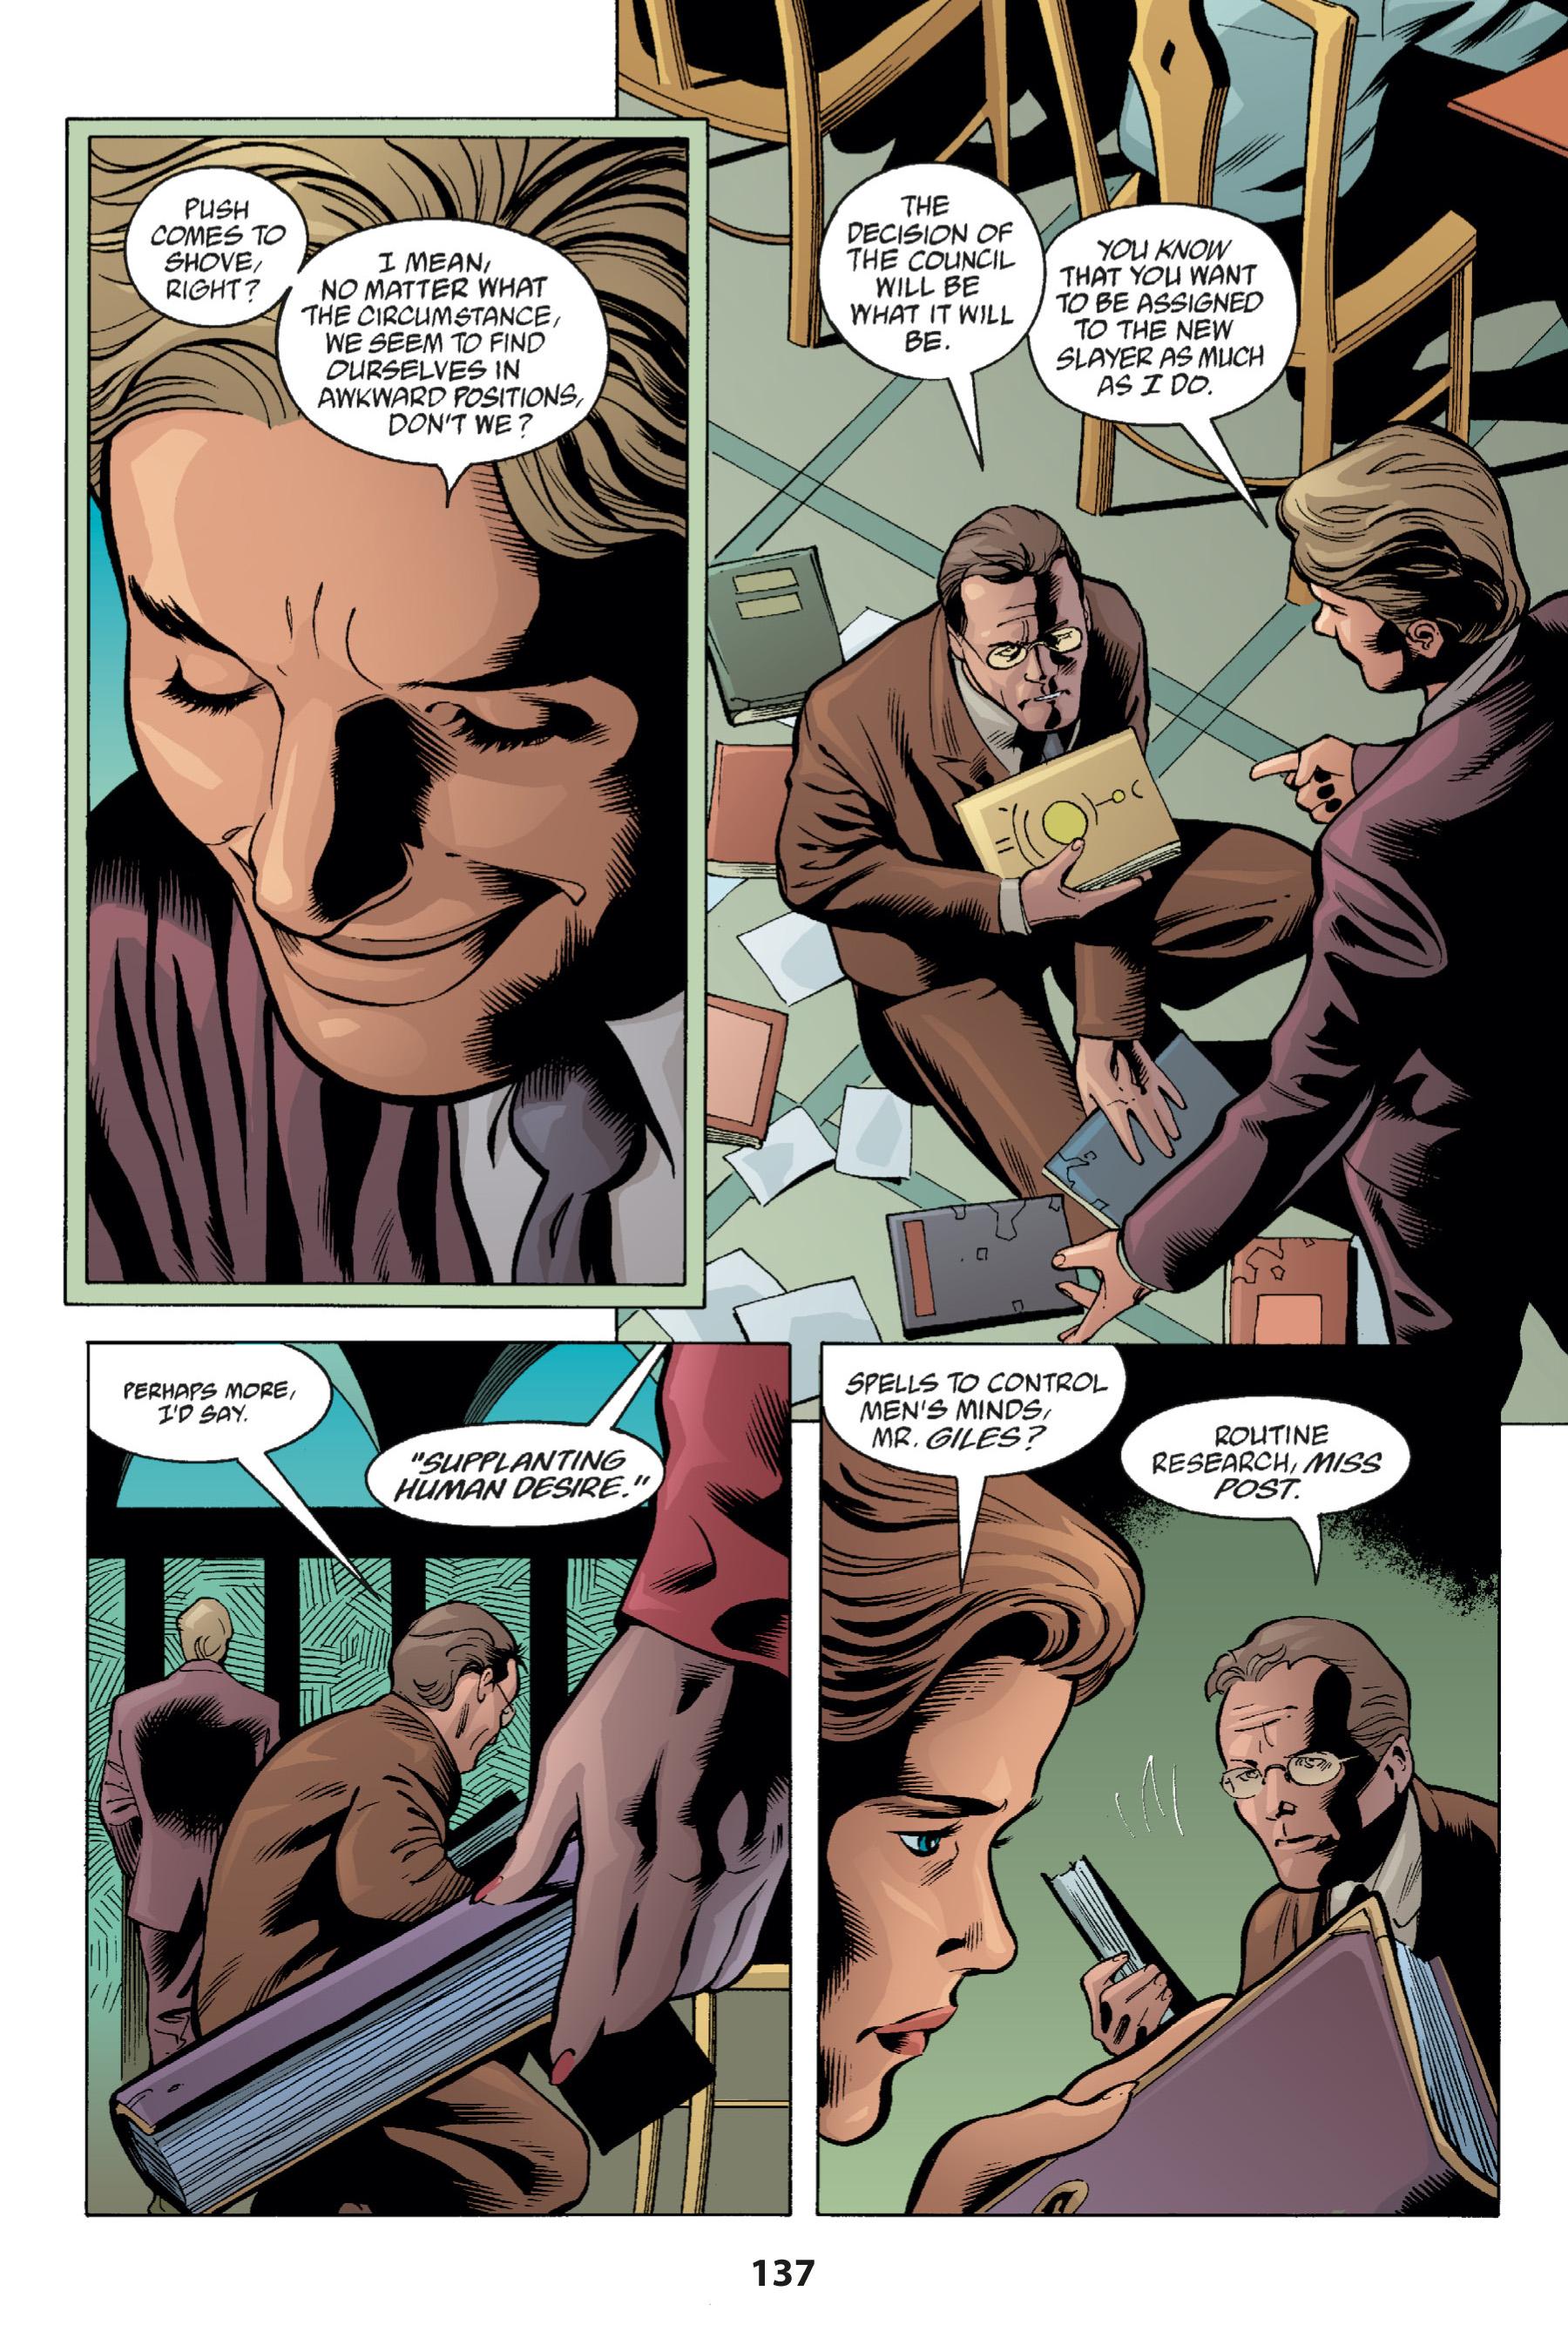 Read online Buffy the Vampire Slayer: Omnibus comic -  Issue # TPB 1 - 136